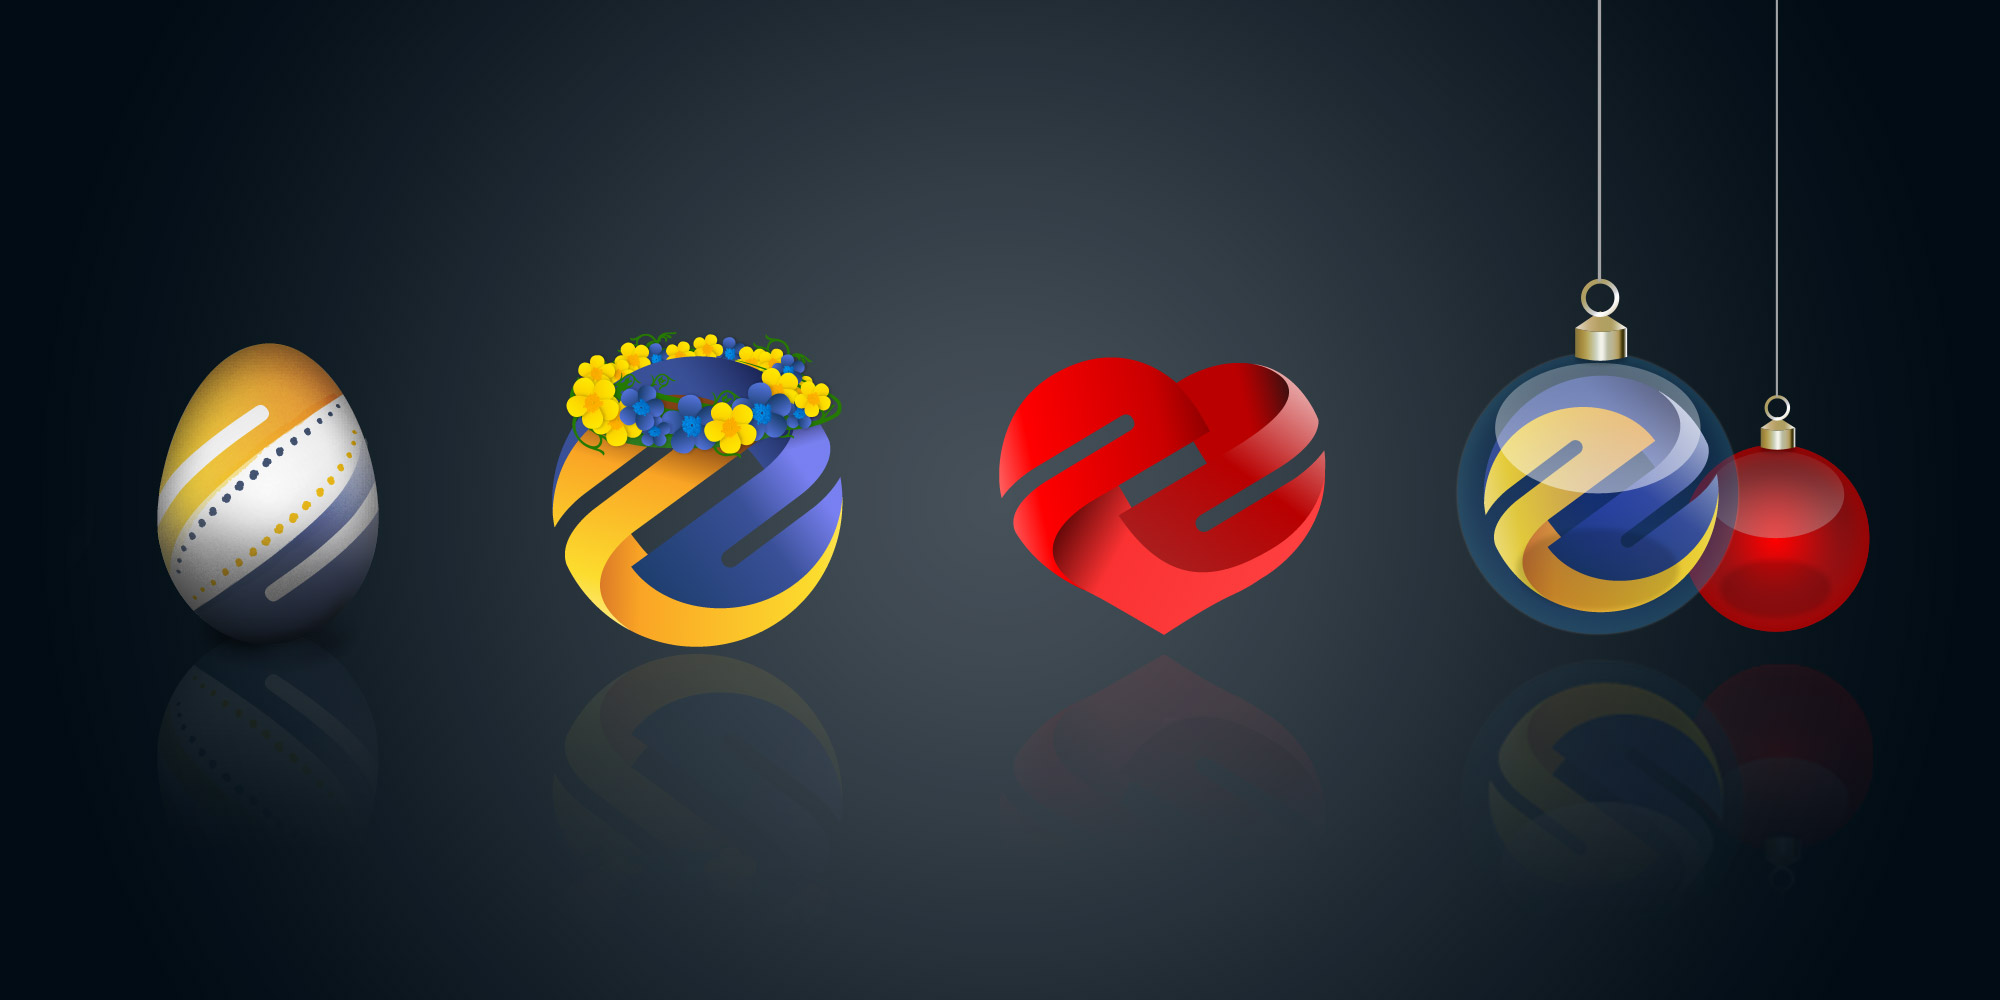 Andreas Hellqvist case image Eniro logos